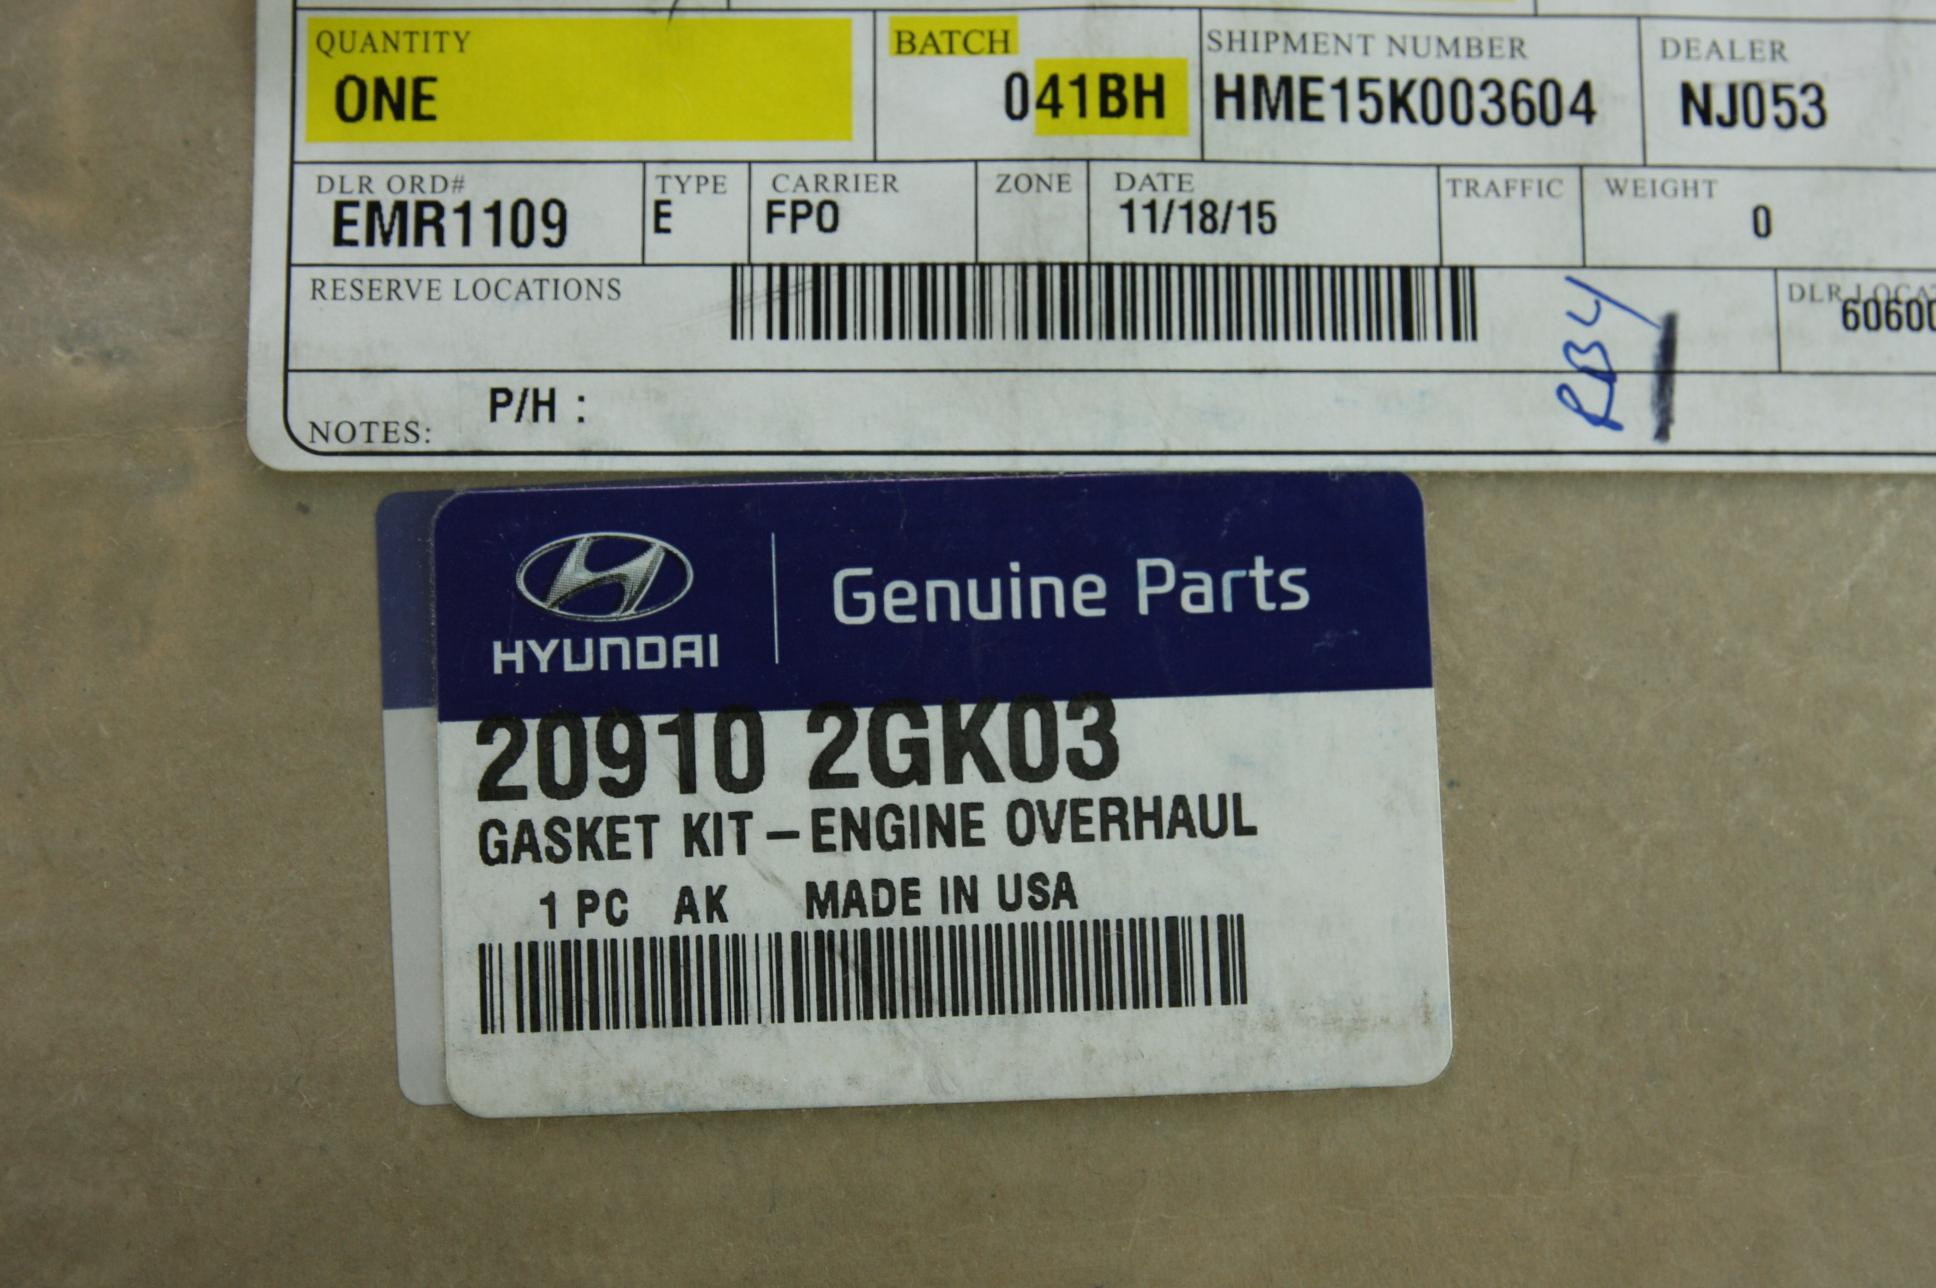 ** New Genuine Hyundai 209102GK03 Full Engine Overhaul Gasket Set Free Shipping - image 2